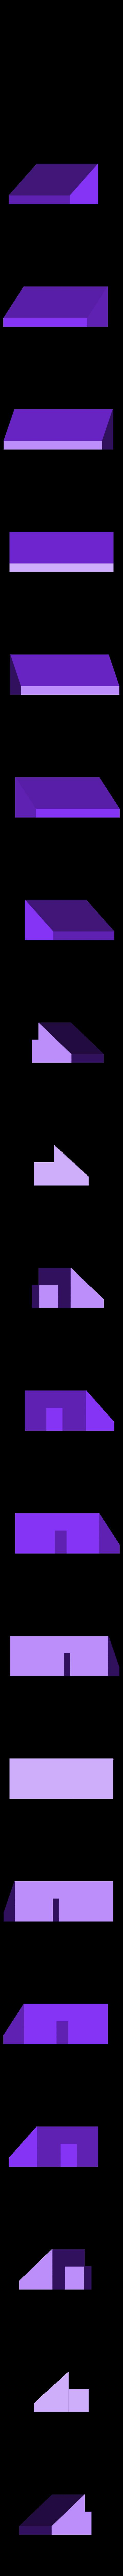 windows.stl Download free STL file BUNGALOW • 3D printing design, onkar